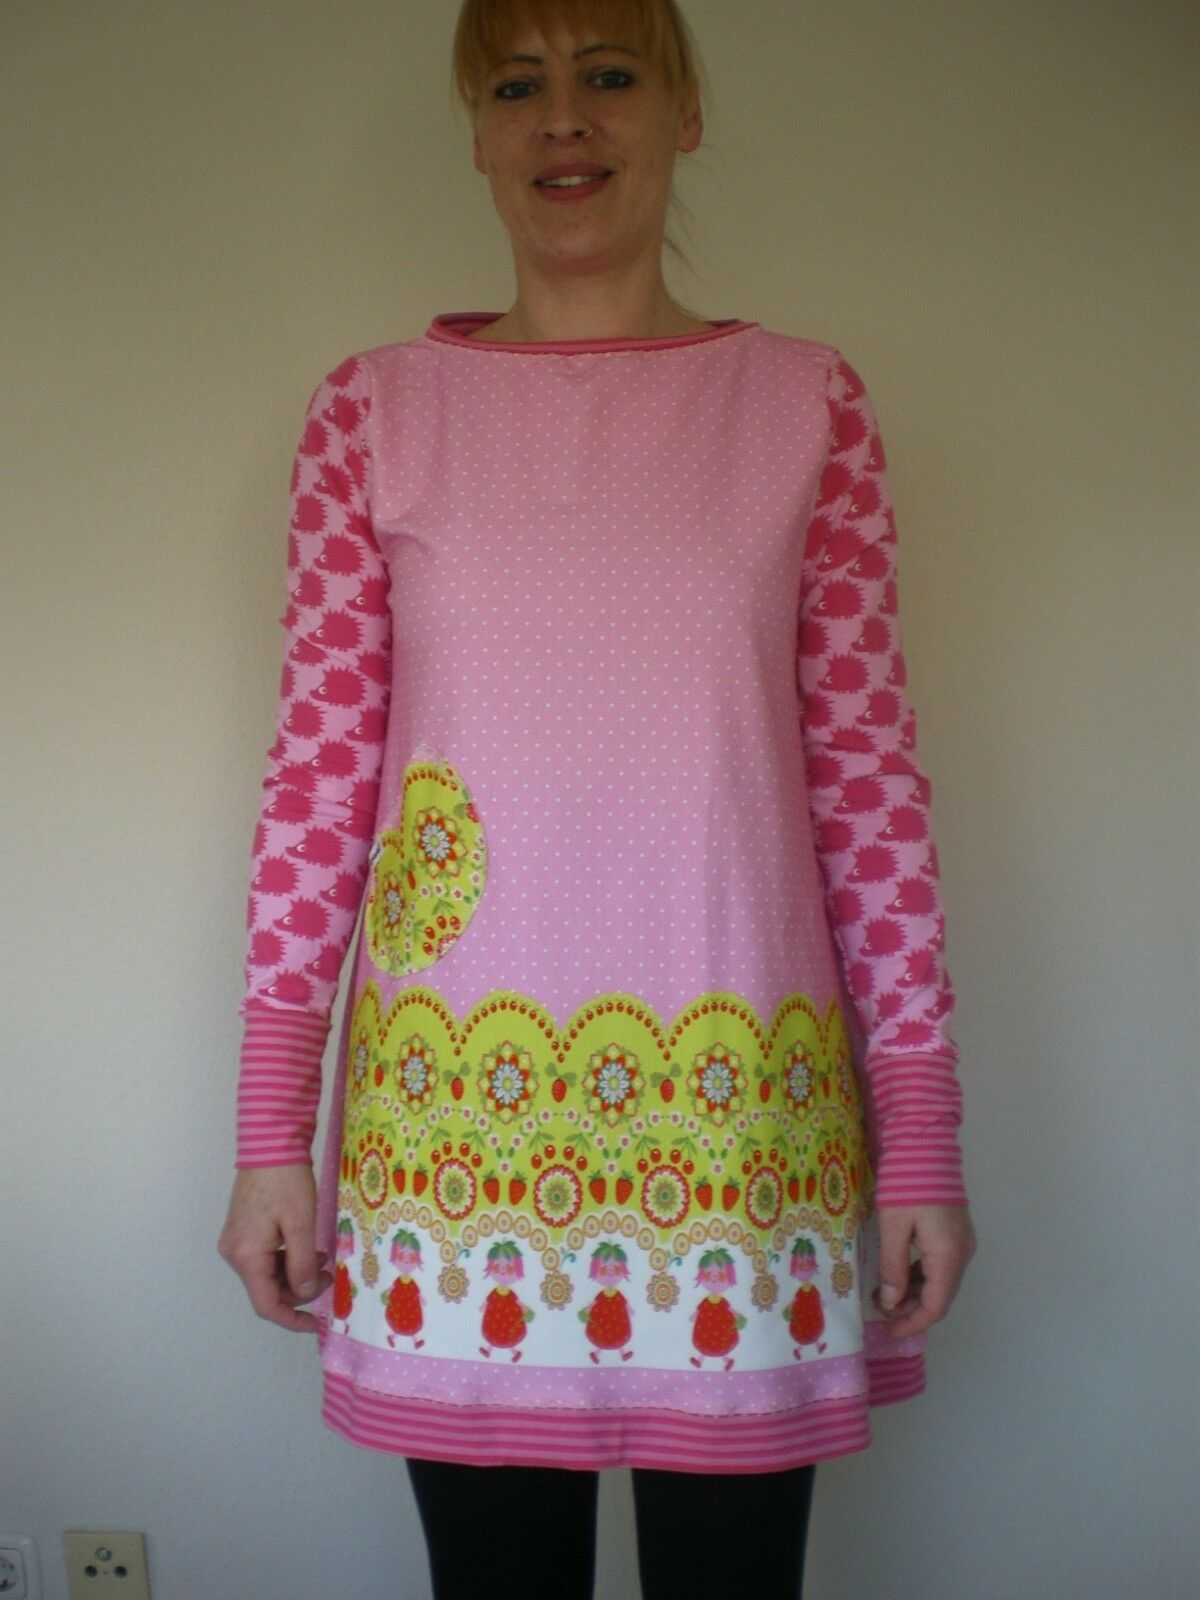 Tunika Ballonkleid Kleid Dawanda etsy Gr S M M M 36 40 Handmade Jersey MonaArt | Verrückter Preis, Birmingham  | München Online Shop  | Online Outlet Shop  c084e3